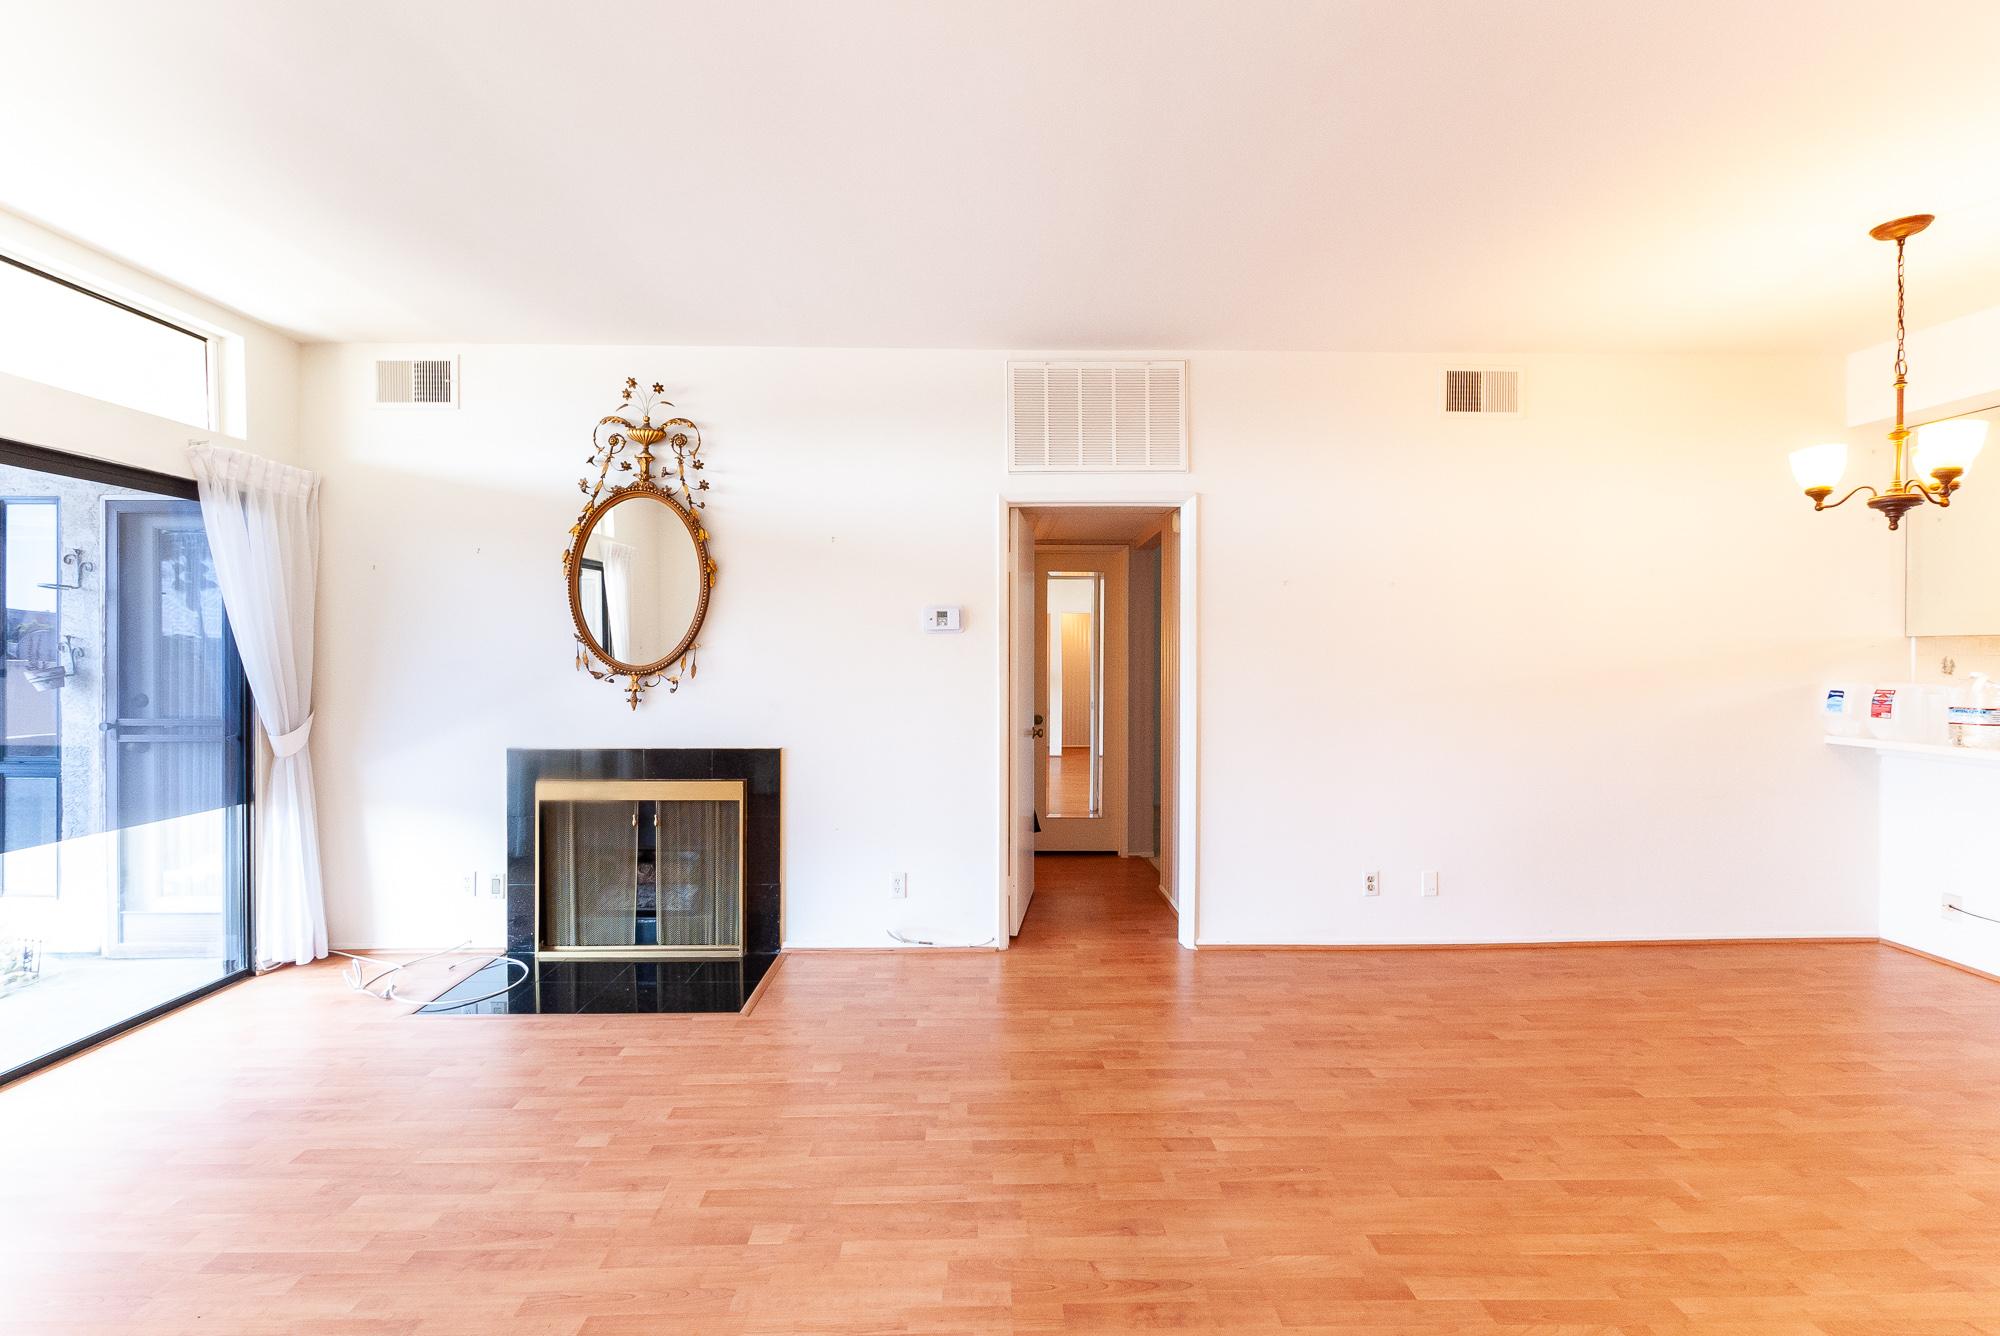 Eye Poppin Arty, Retro -2 Bed /2 Bath  -  Den/3rd Bedroom/Fireplace - Huge Balcony -Prime Ktown Location